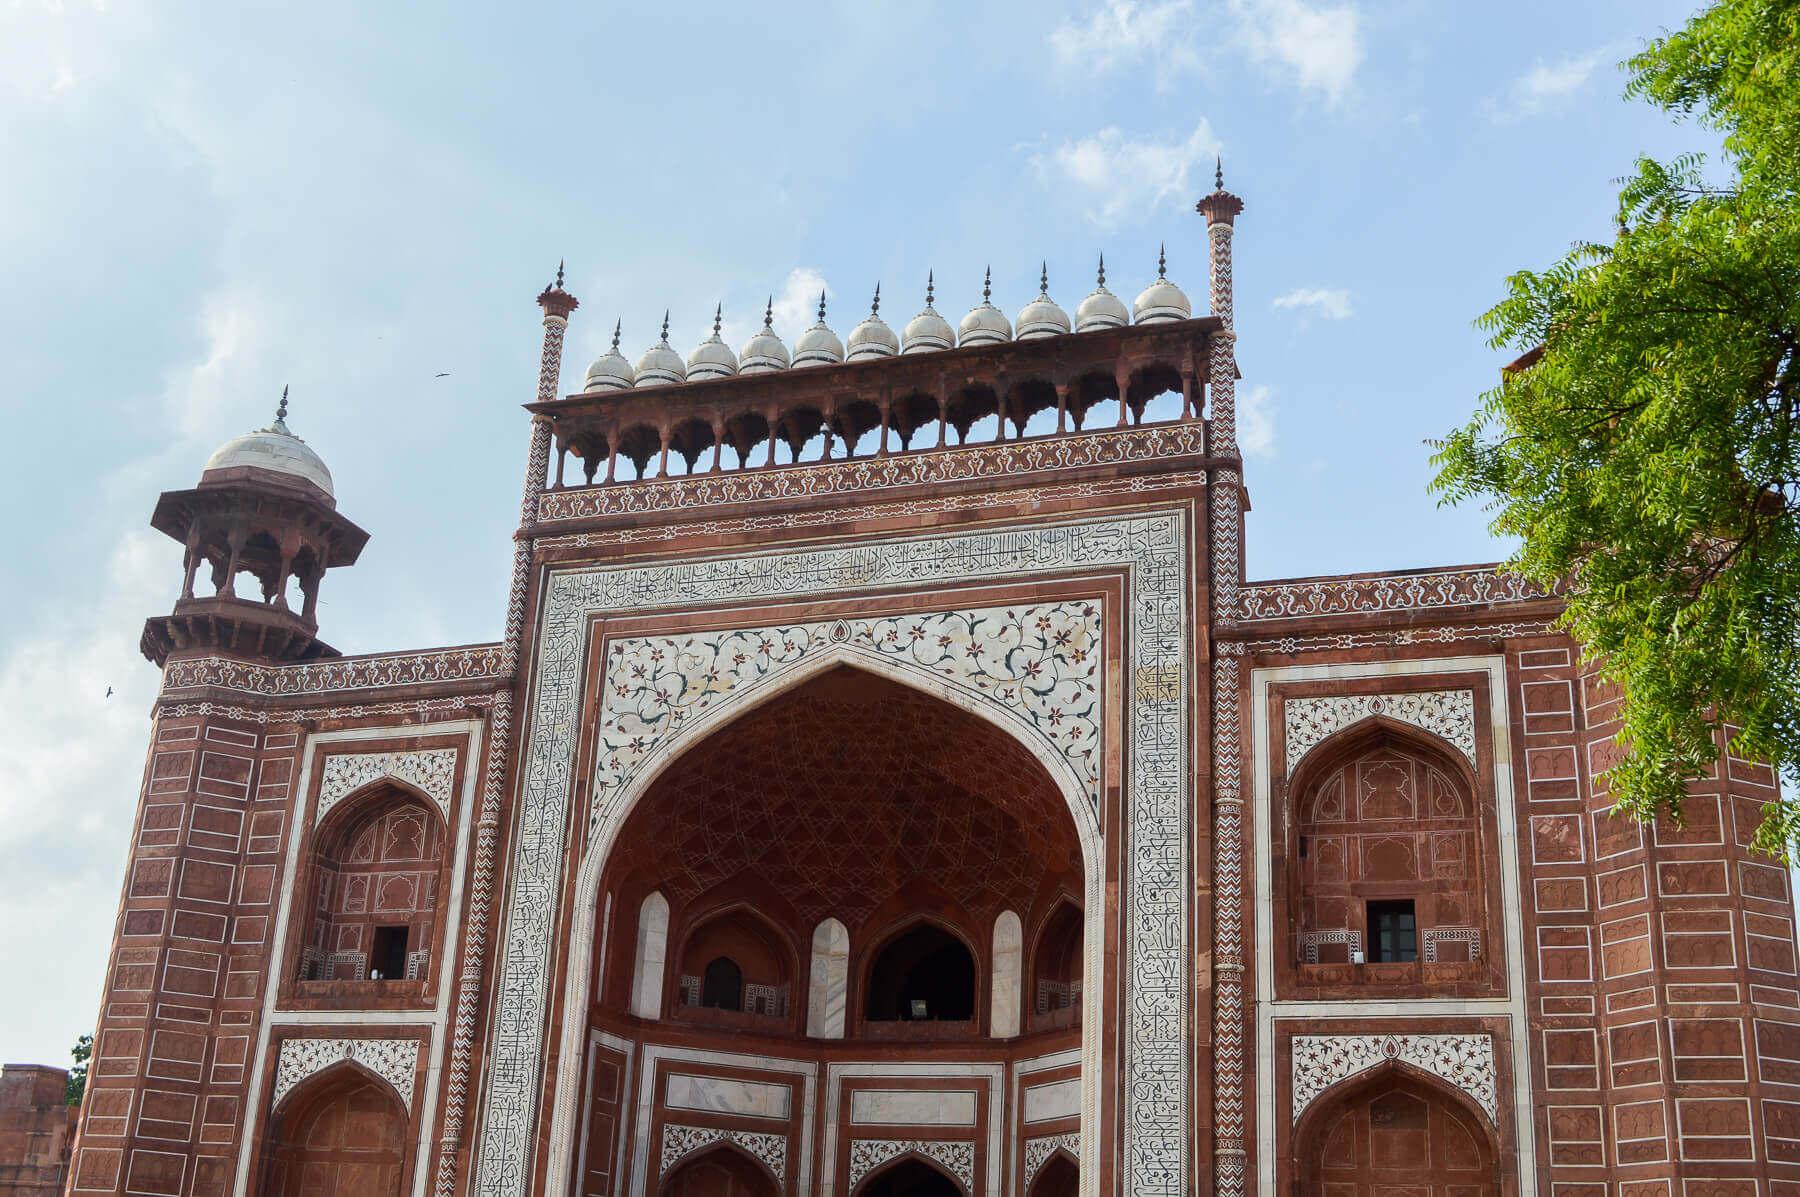 Red stone entrance to Taj Mahal